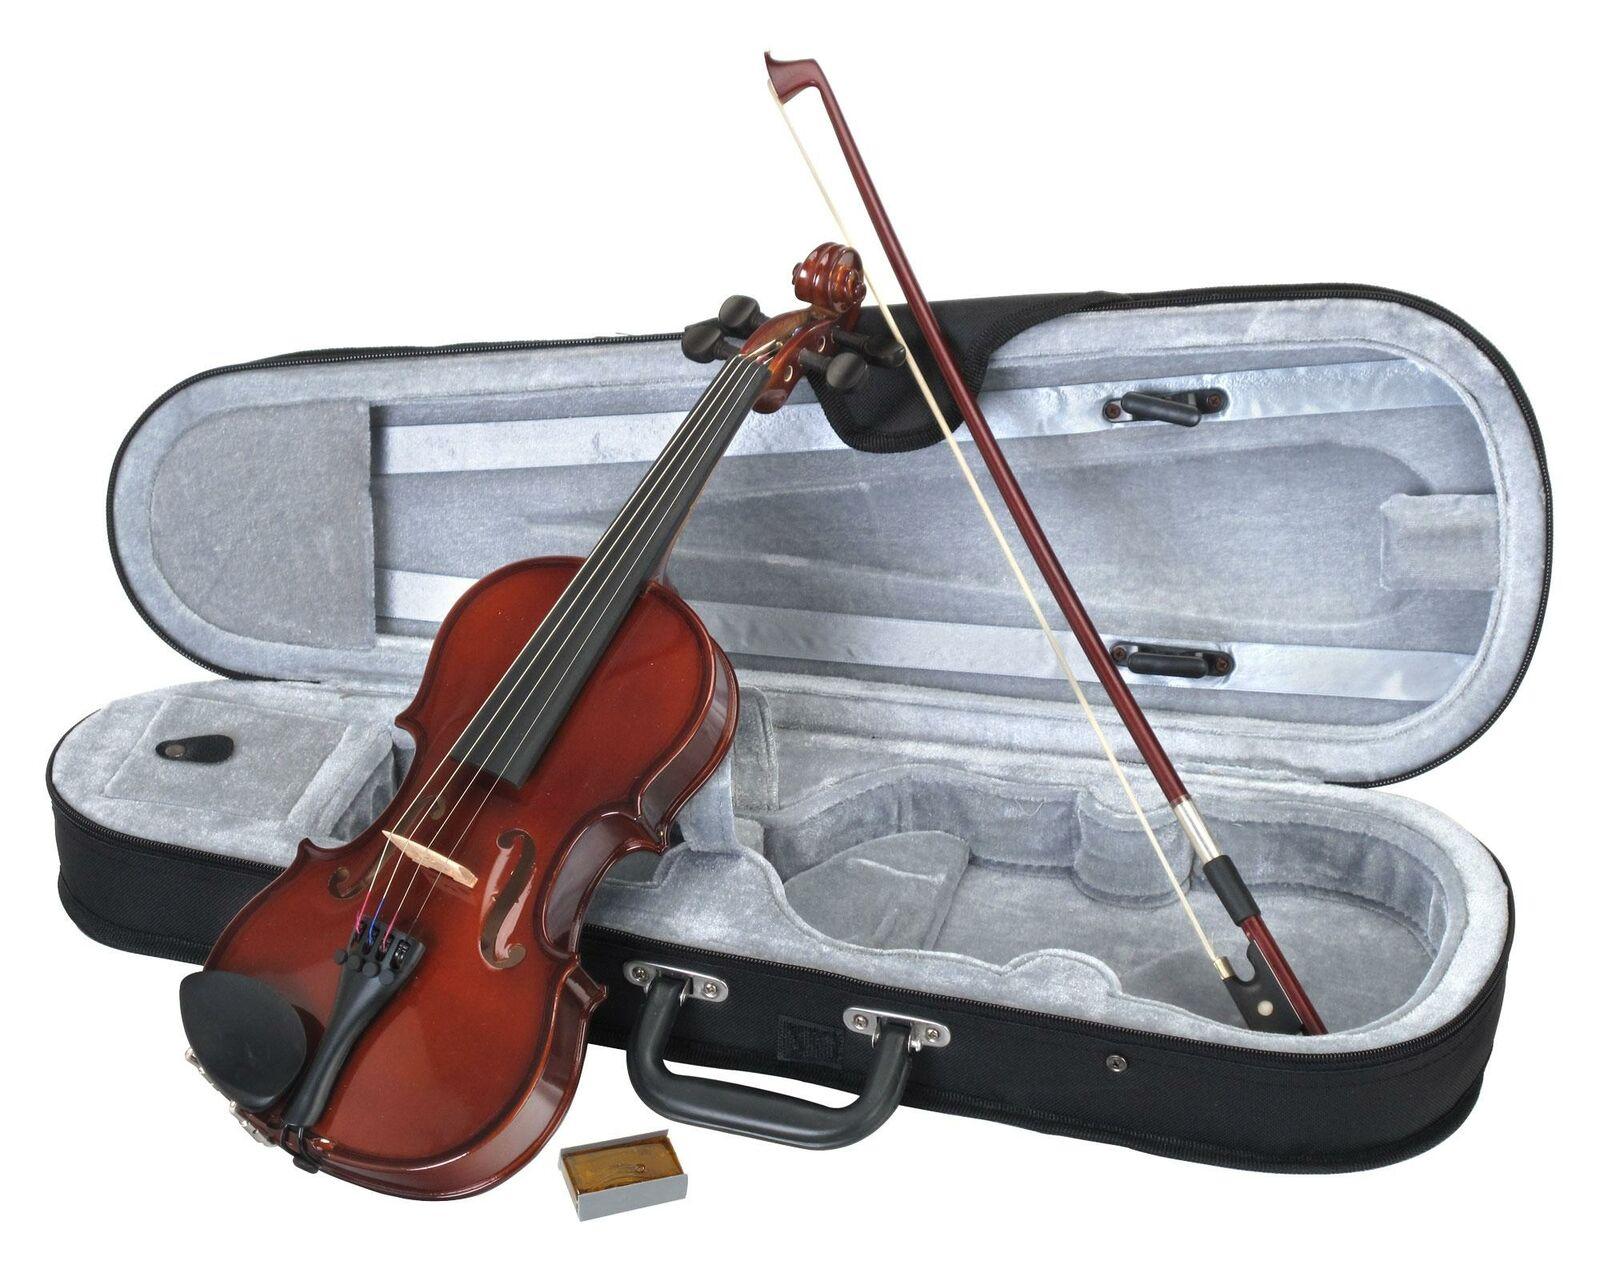 Geigenset 1 4 dimensioni violinenset Violino Violino Set Bambini violino alunni violino